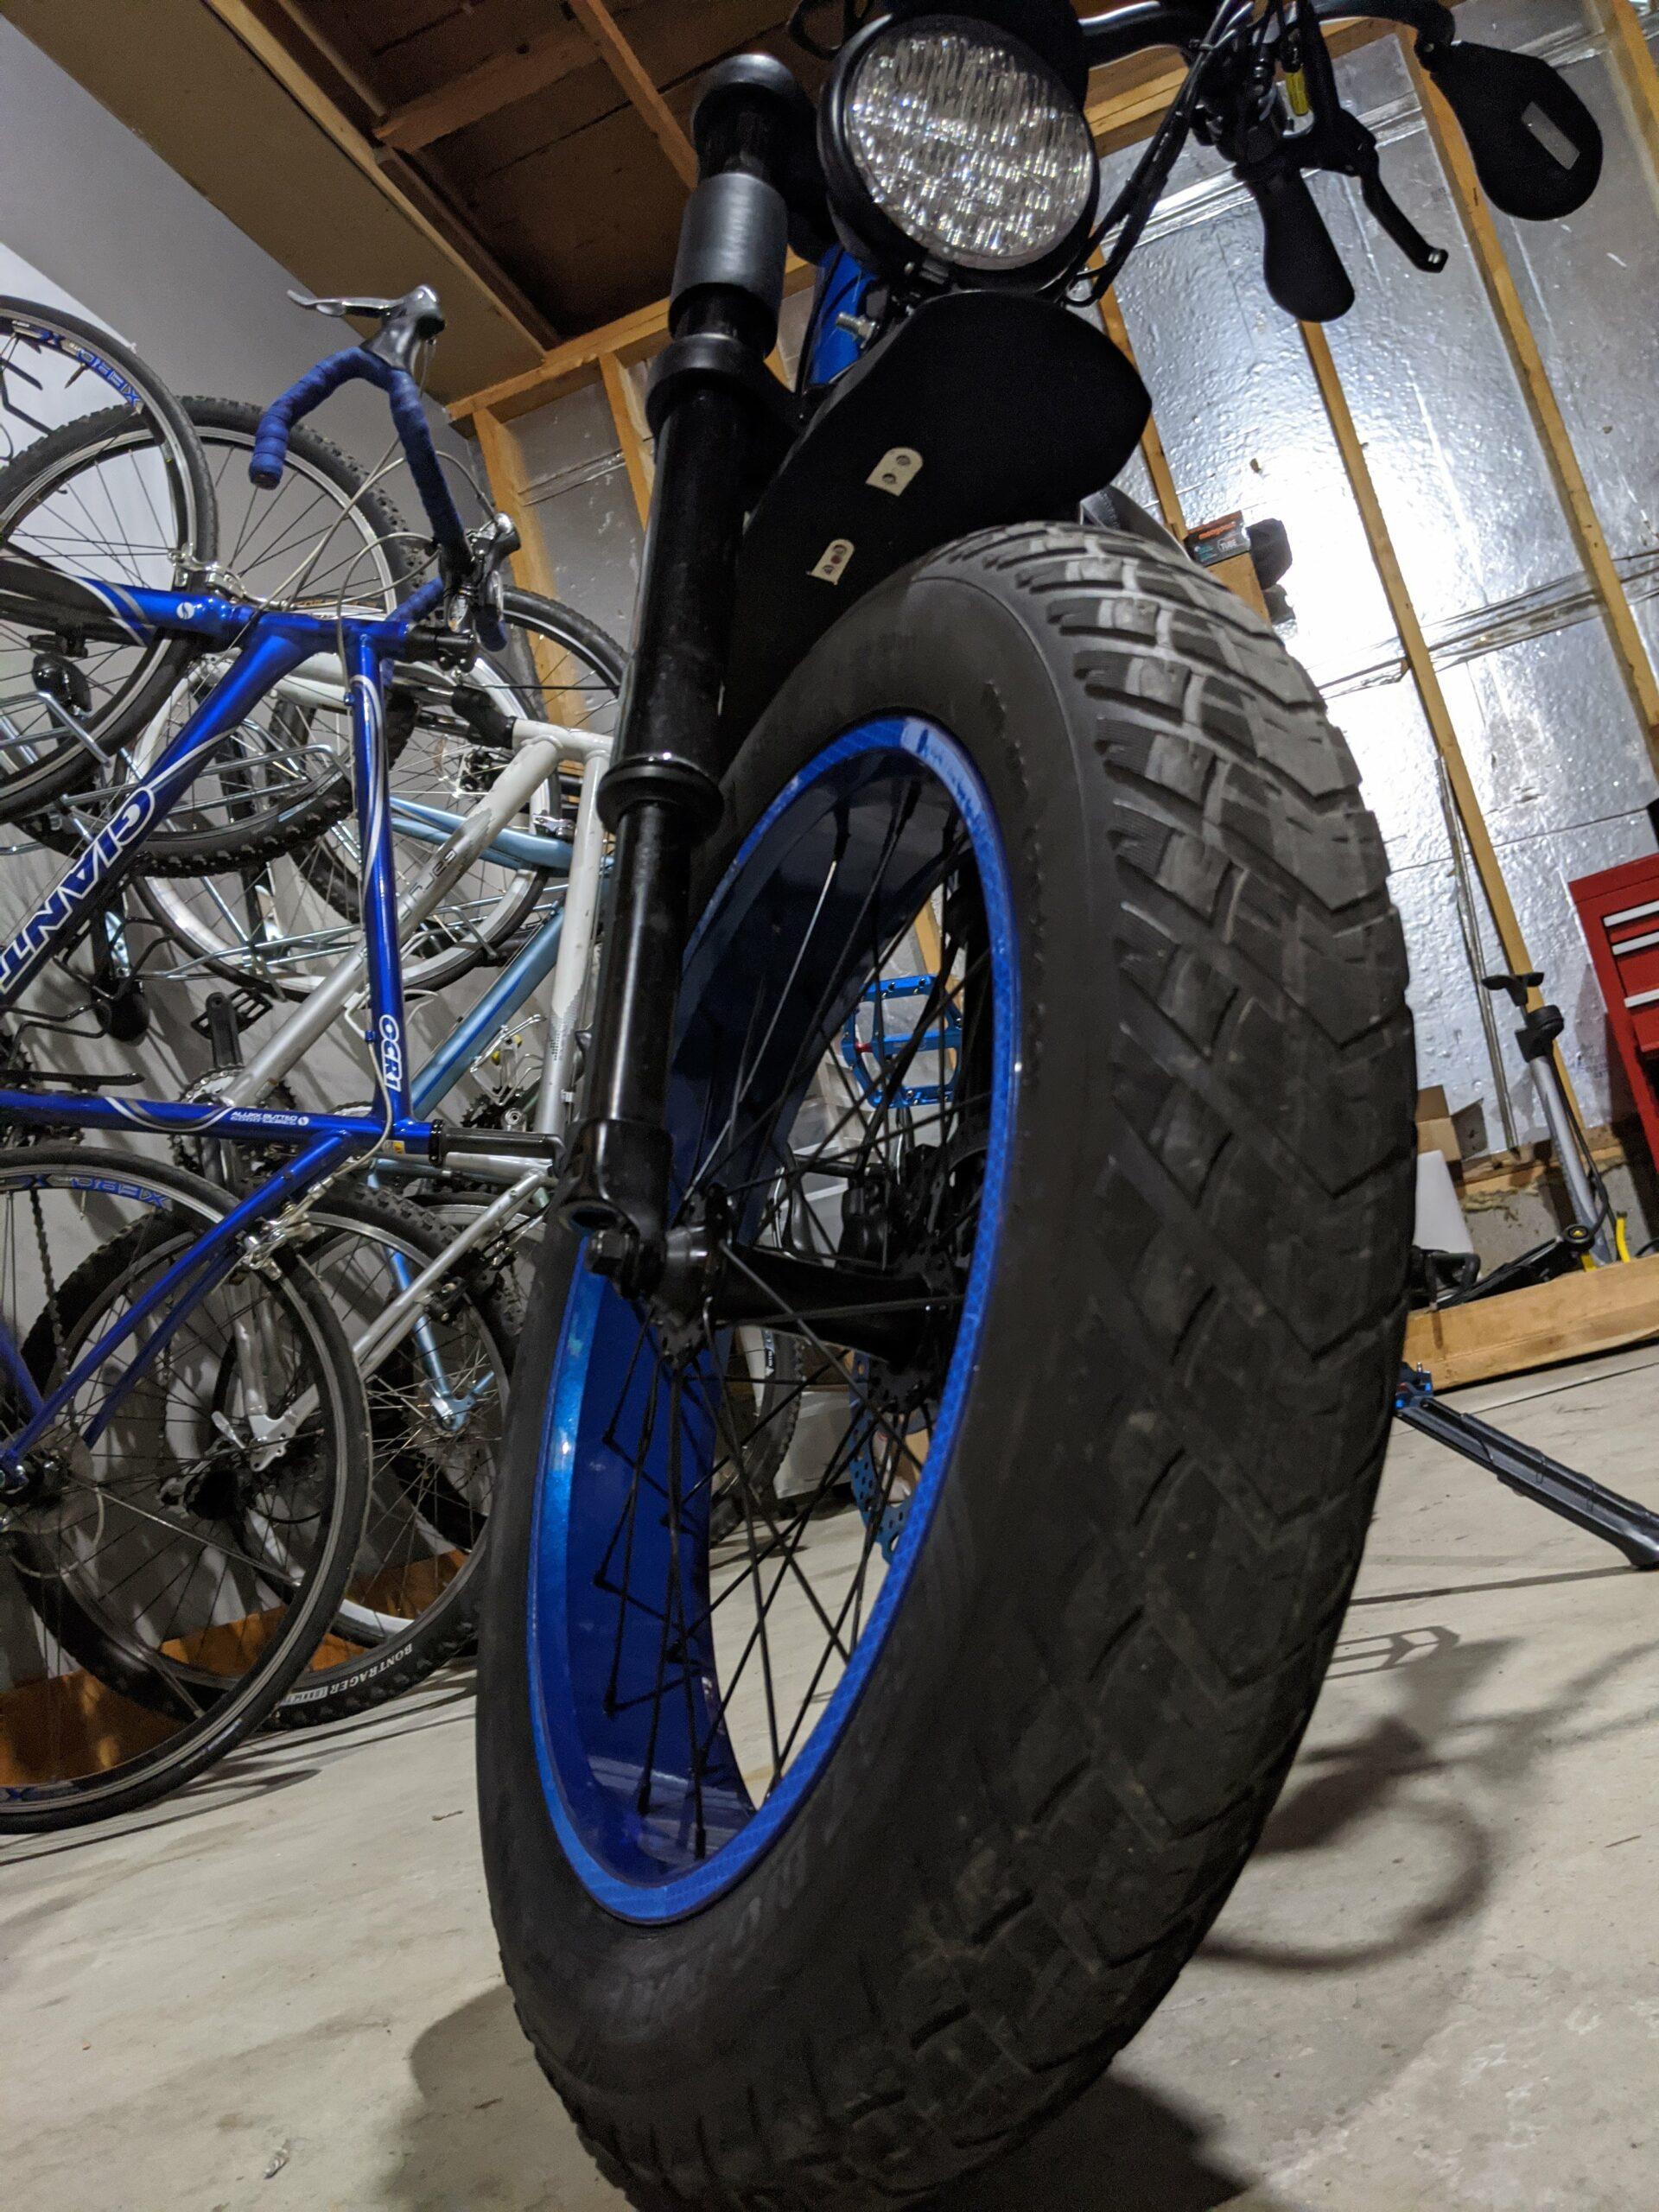 Ariel Rider X-Class Front Tire